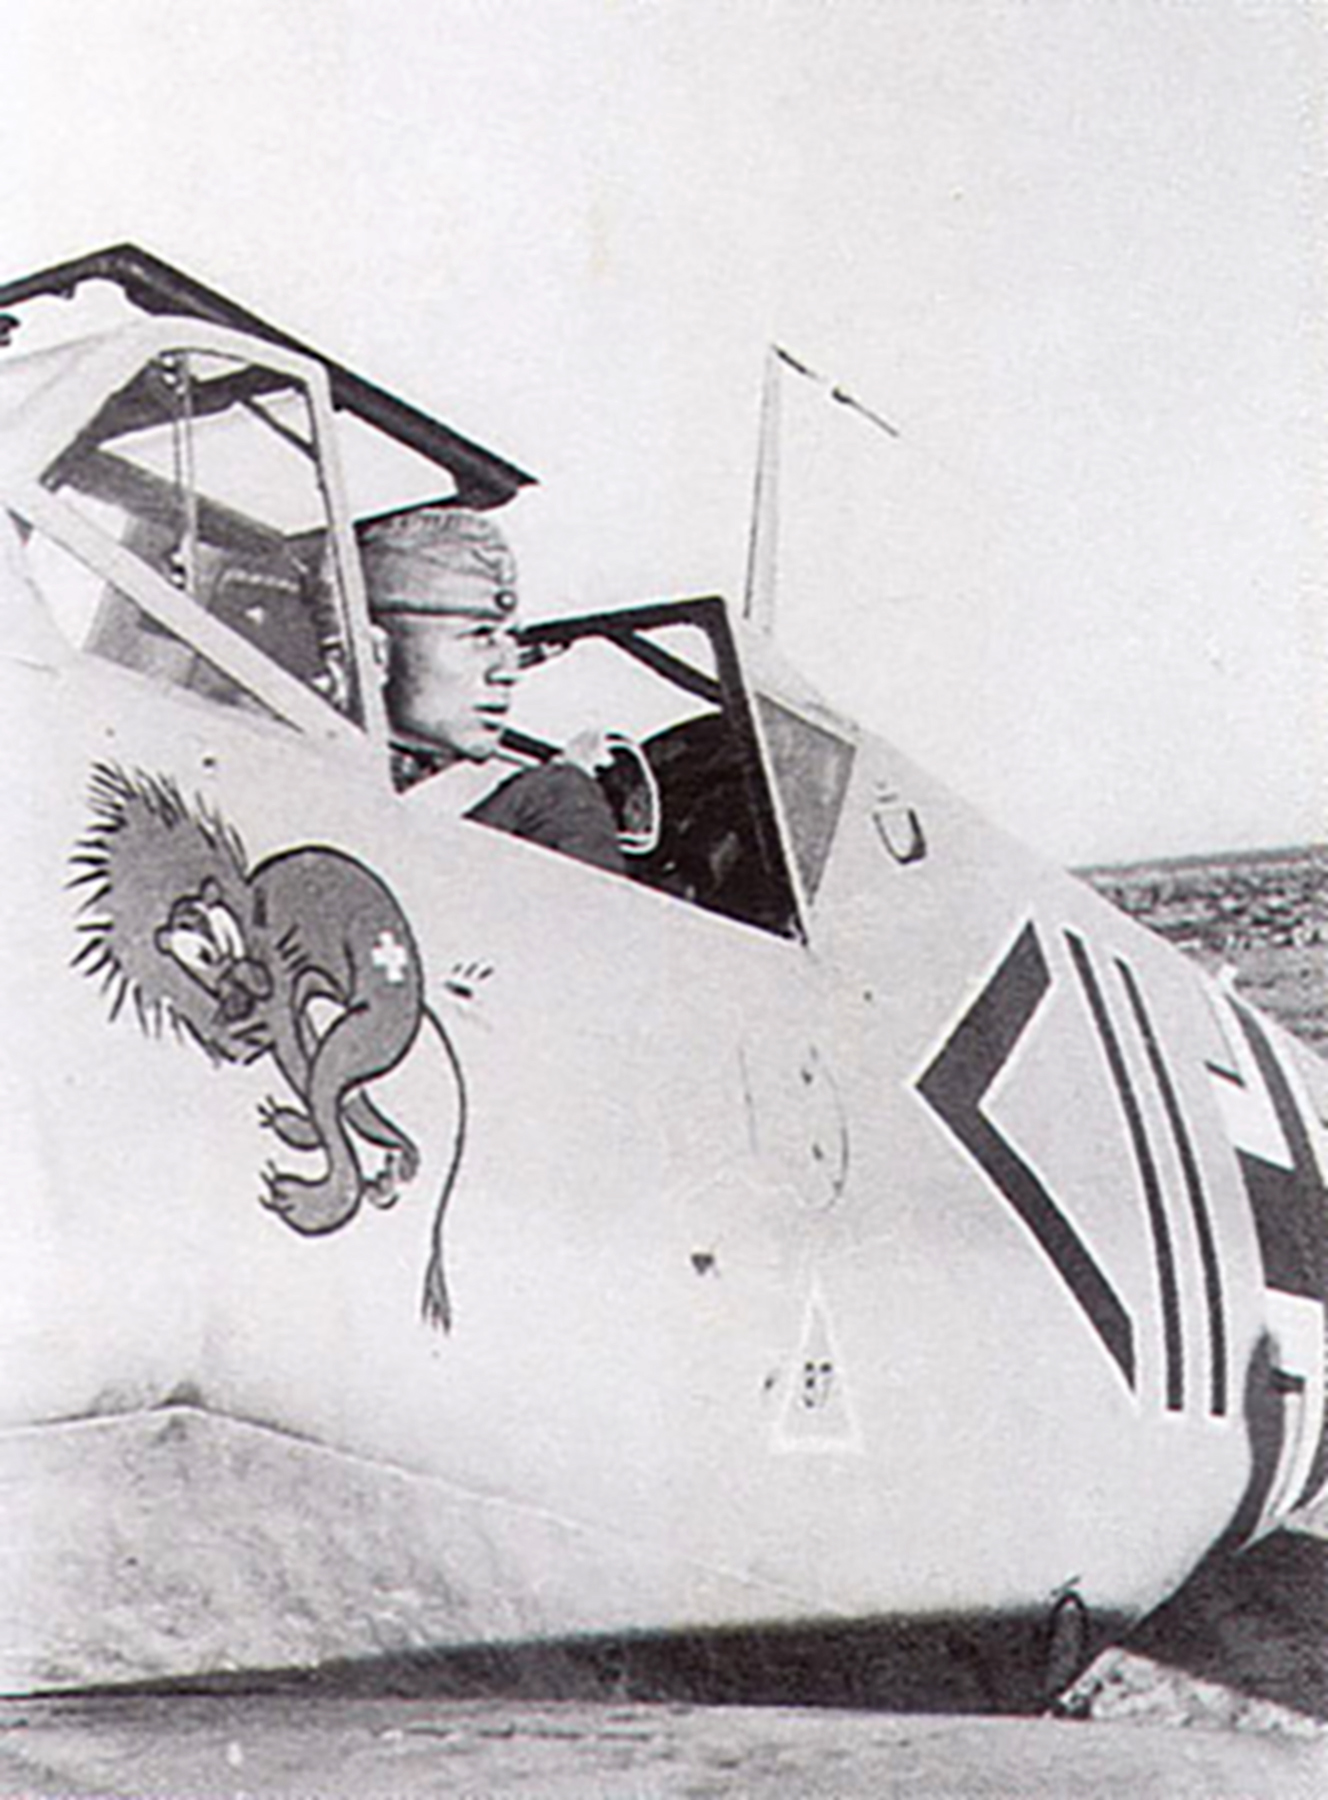 Messerschmitt Bf 109F4Trop Stab II.JG27 Otto Schulz WNr 10271 El Gazala 1941 01